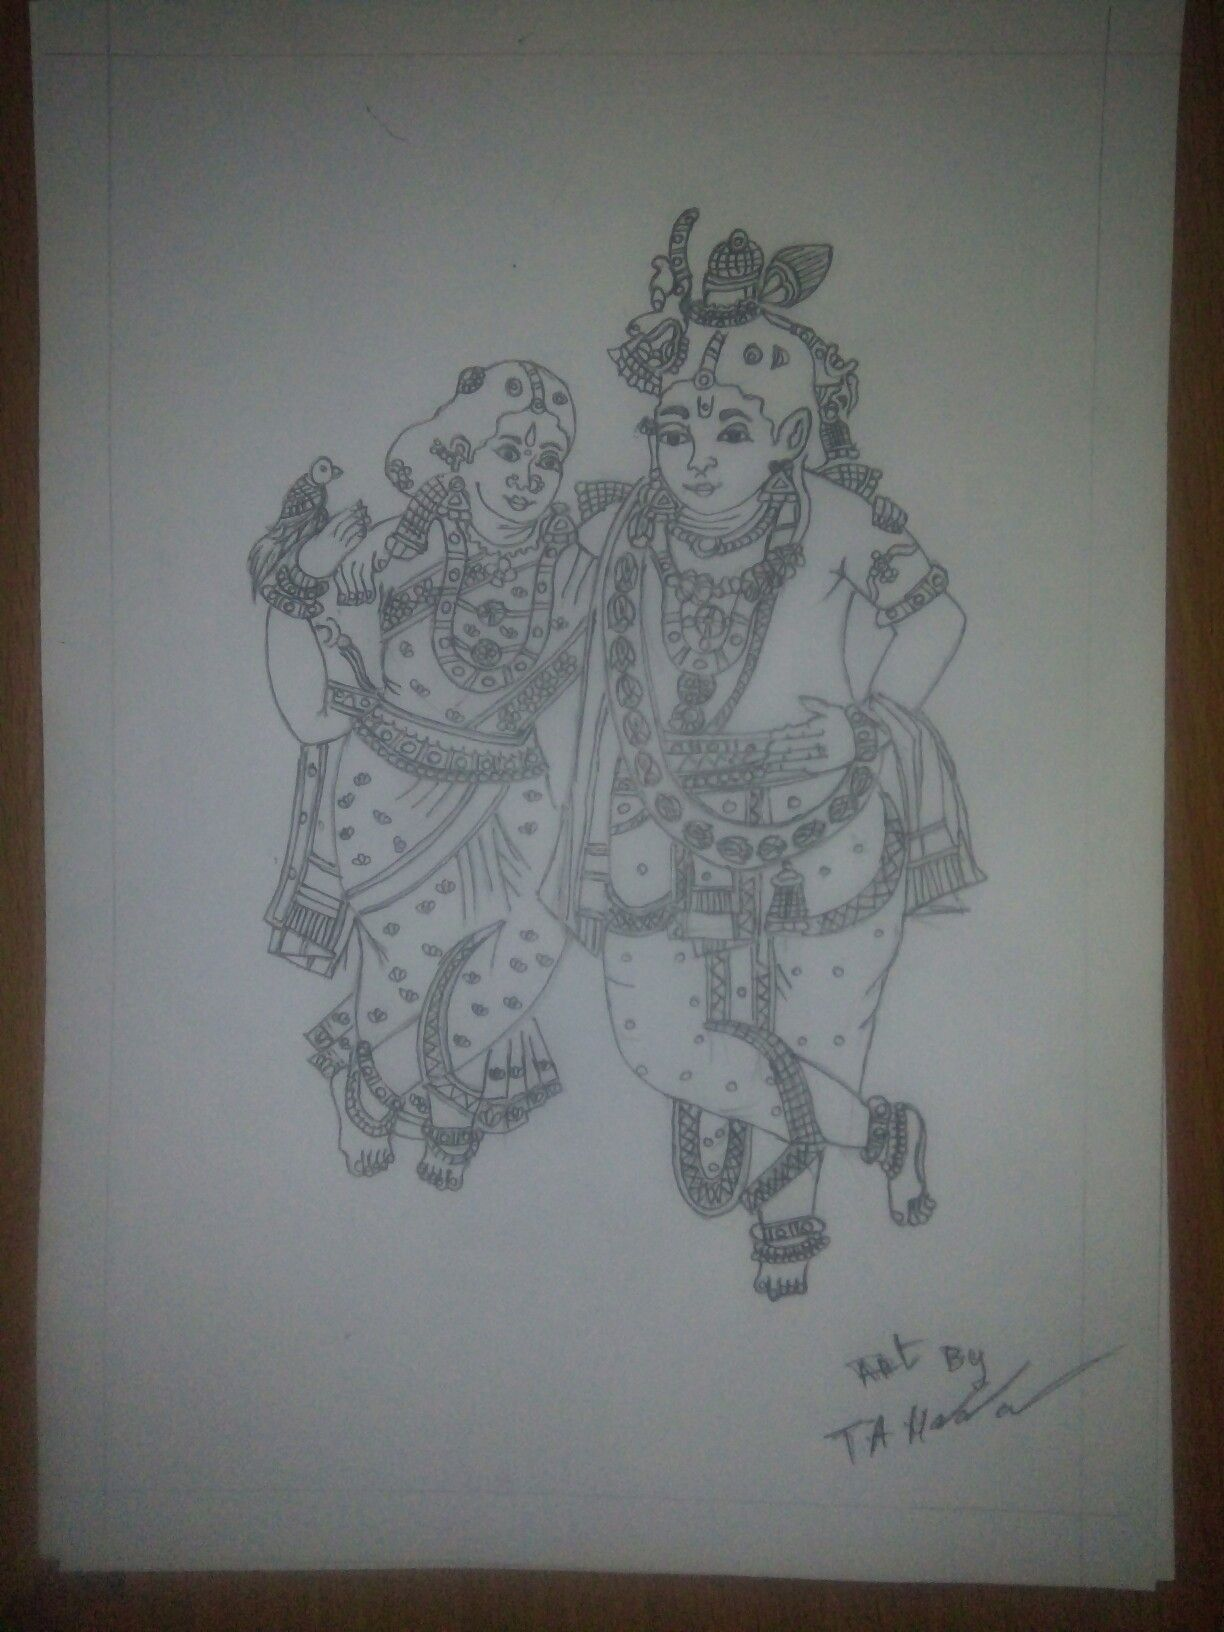 Radhe krish